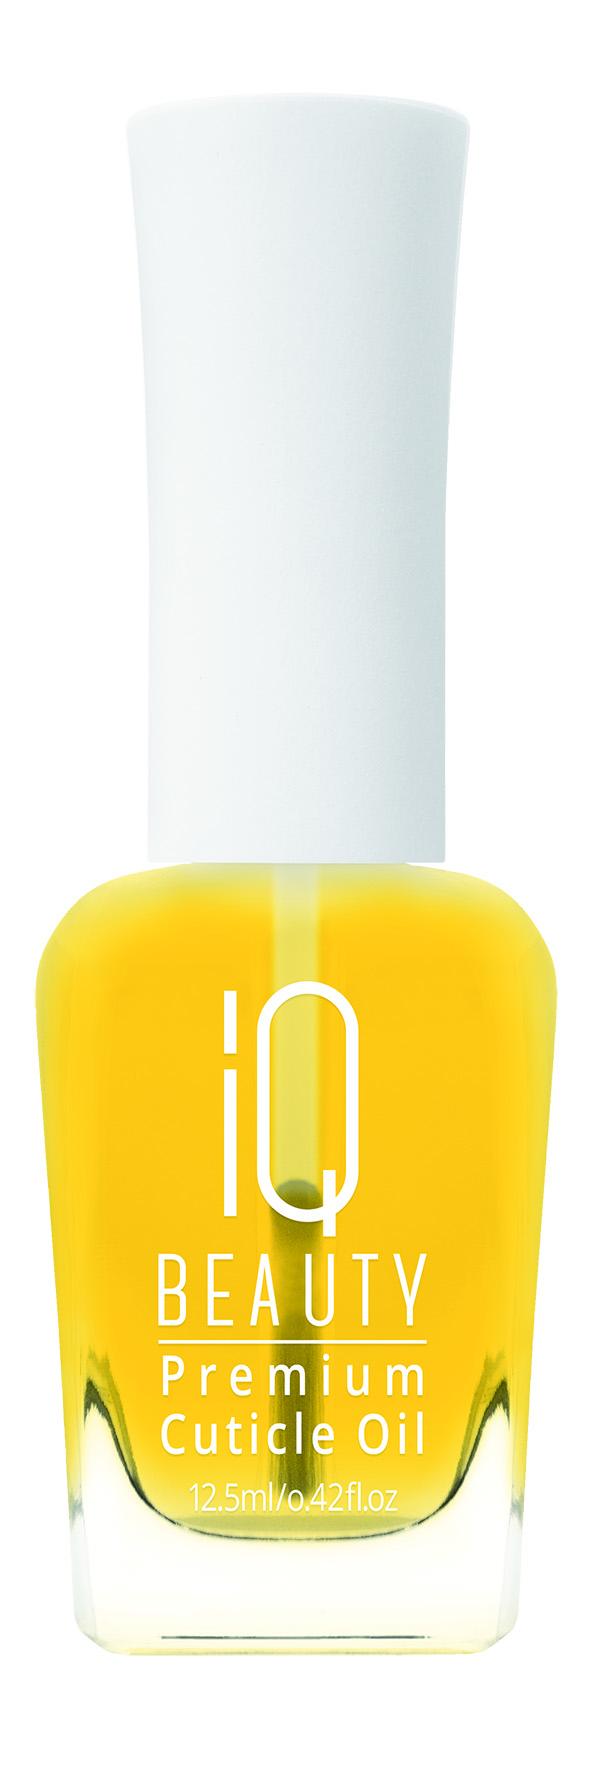 IQ BEAUTY Масло обогащённое для кутикулы /Premium Cuticle Oil, 12,5мл